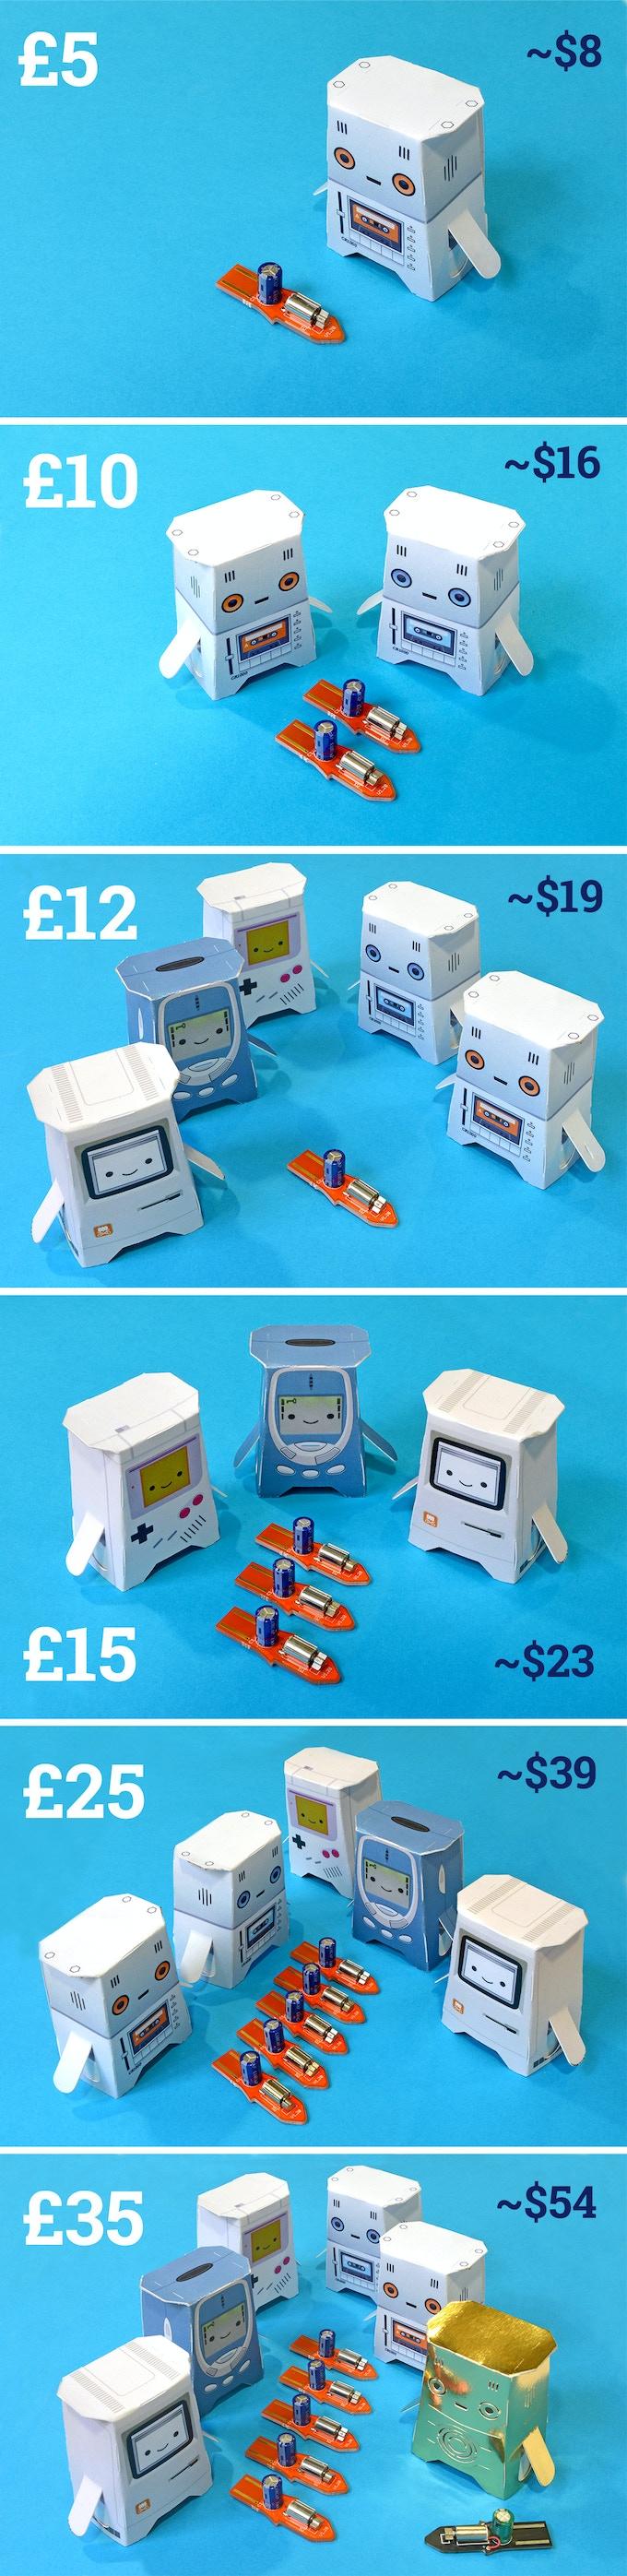 Crafty Robot Rewards